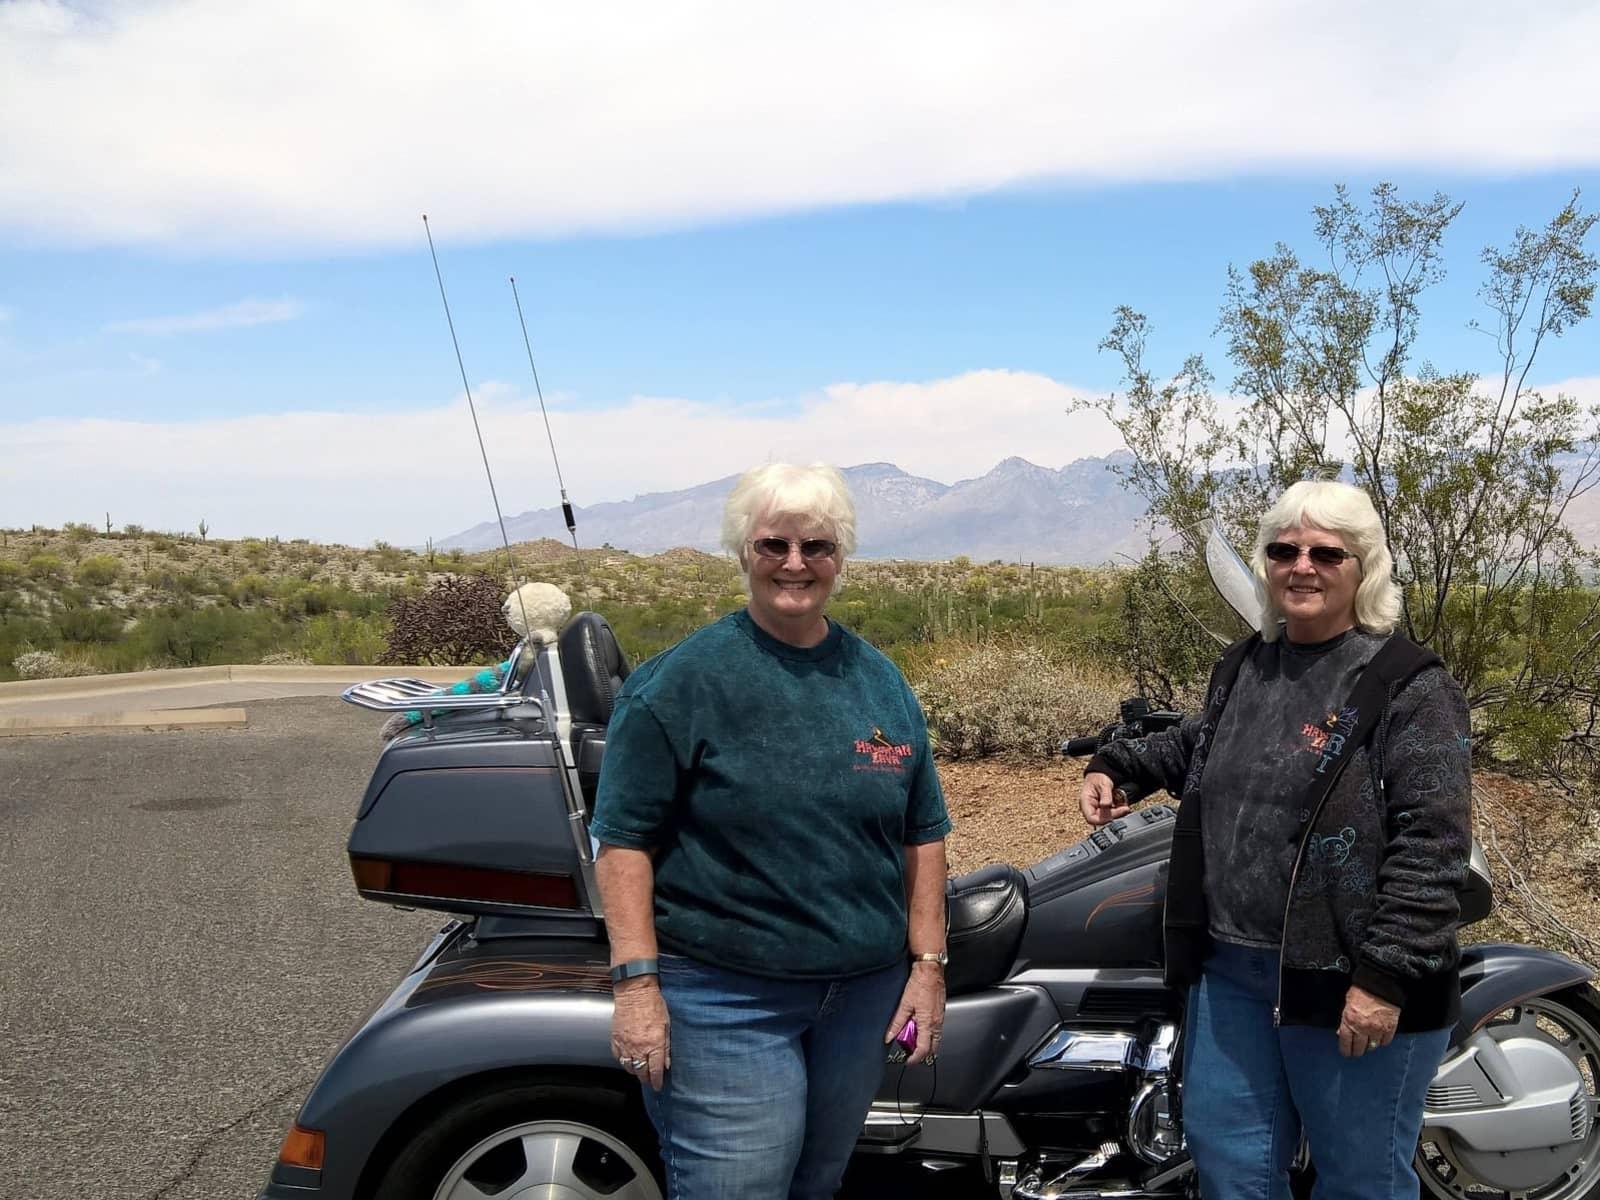 Linda e & Jeanette from Tucson, Arizona, United States